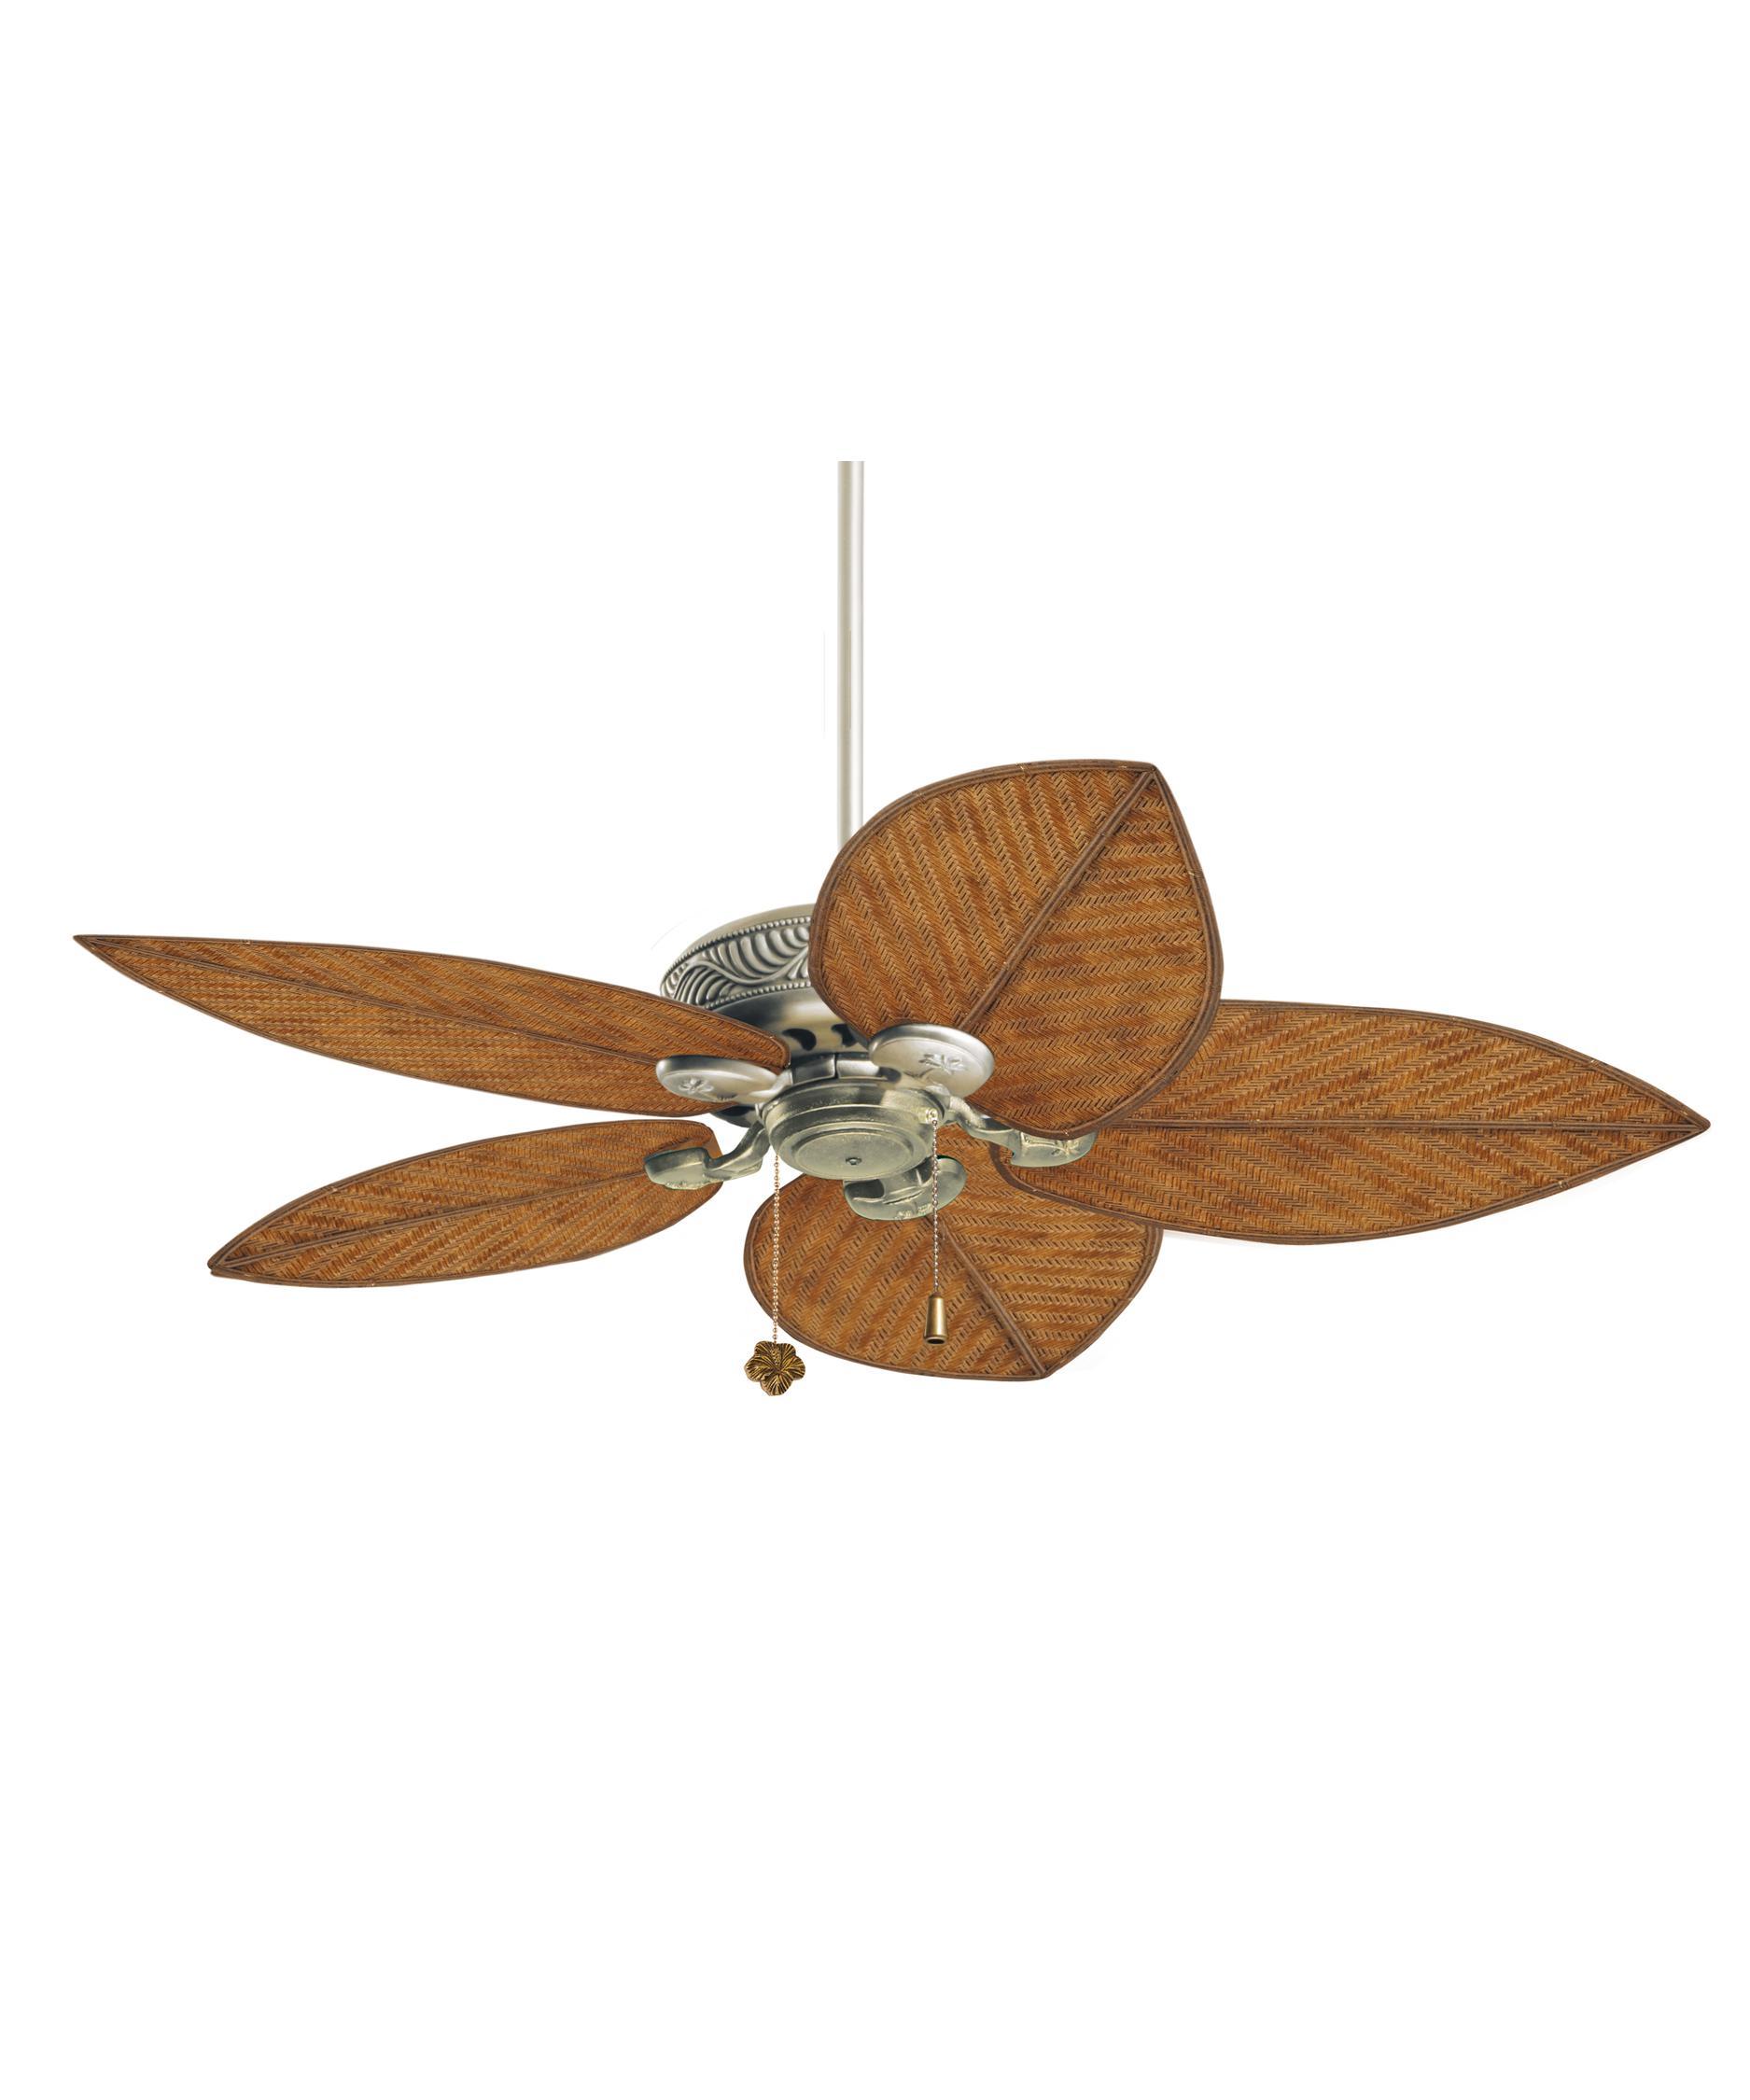 Tommy Bahama Tb344 Bahama Breezes 52 Inch Ceiling Fan